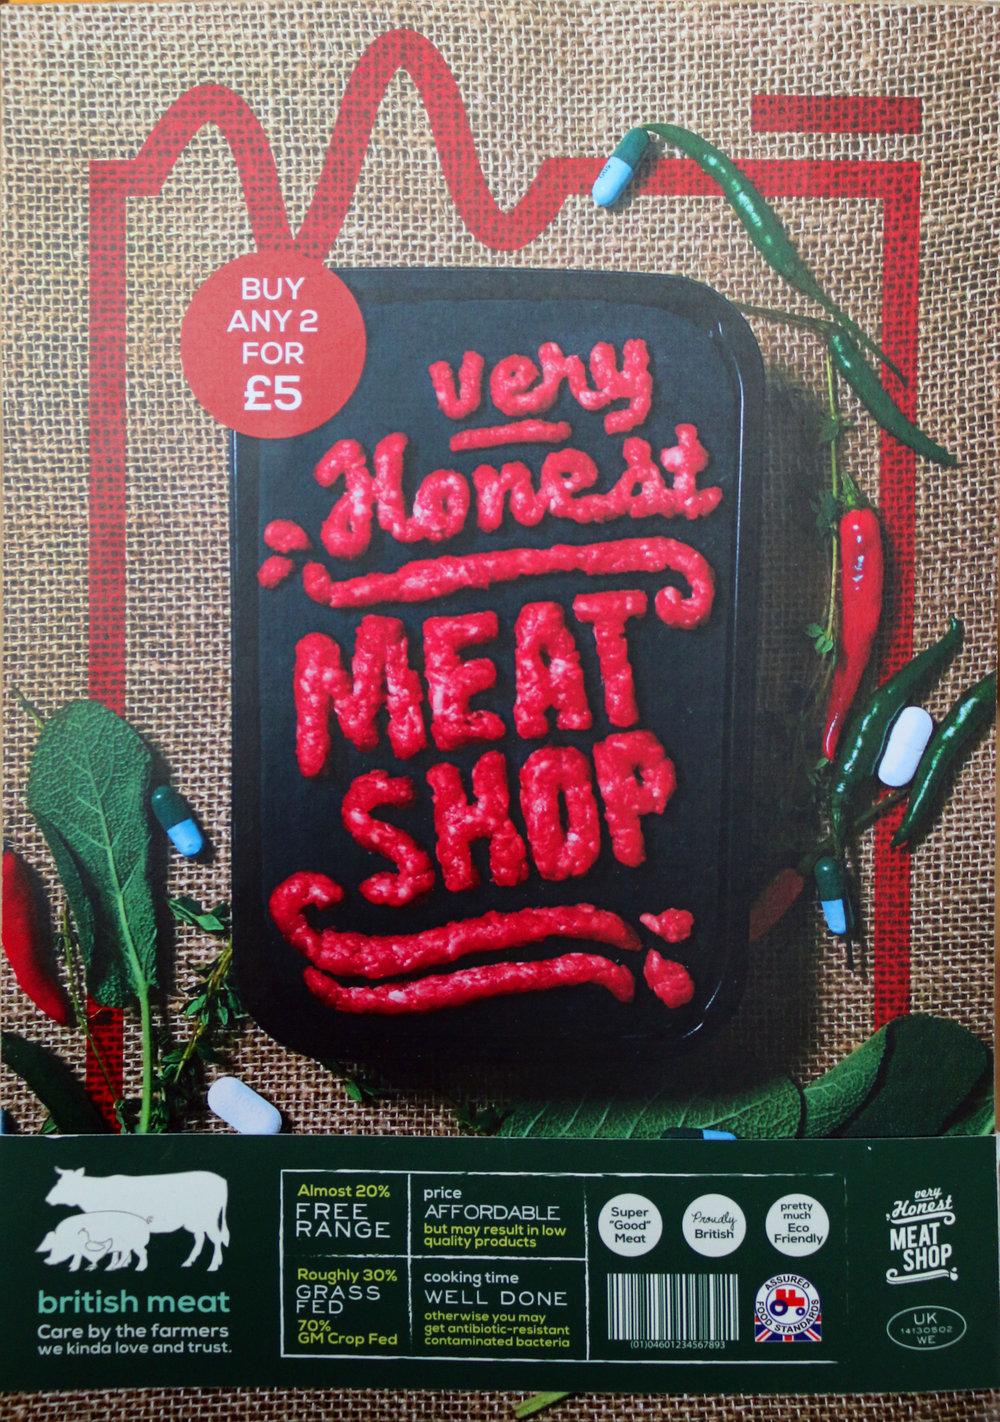 Chayanut Ratanachai -'Very Honest Meat Shop'